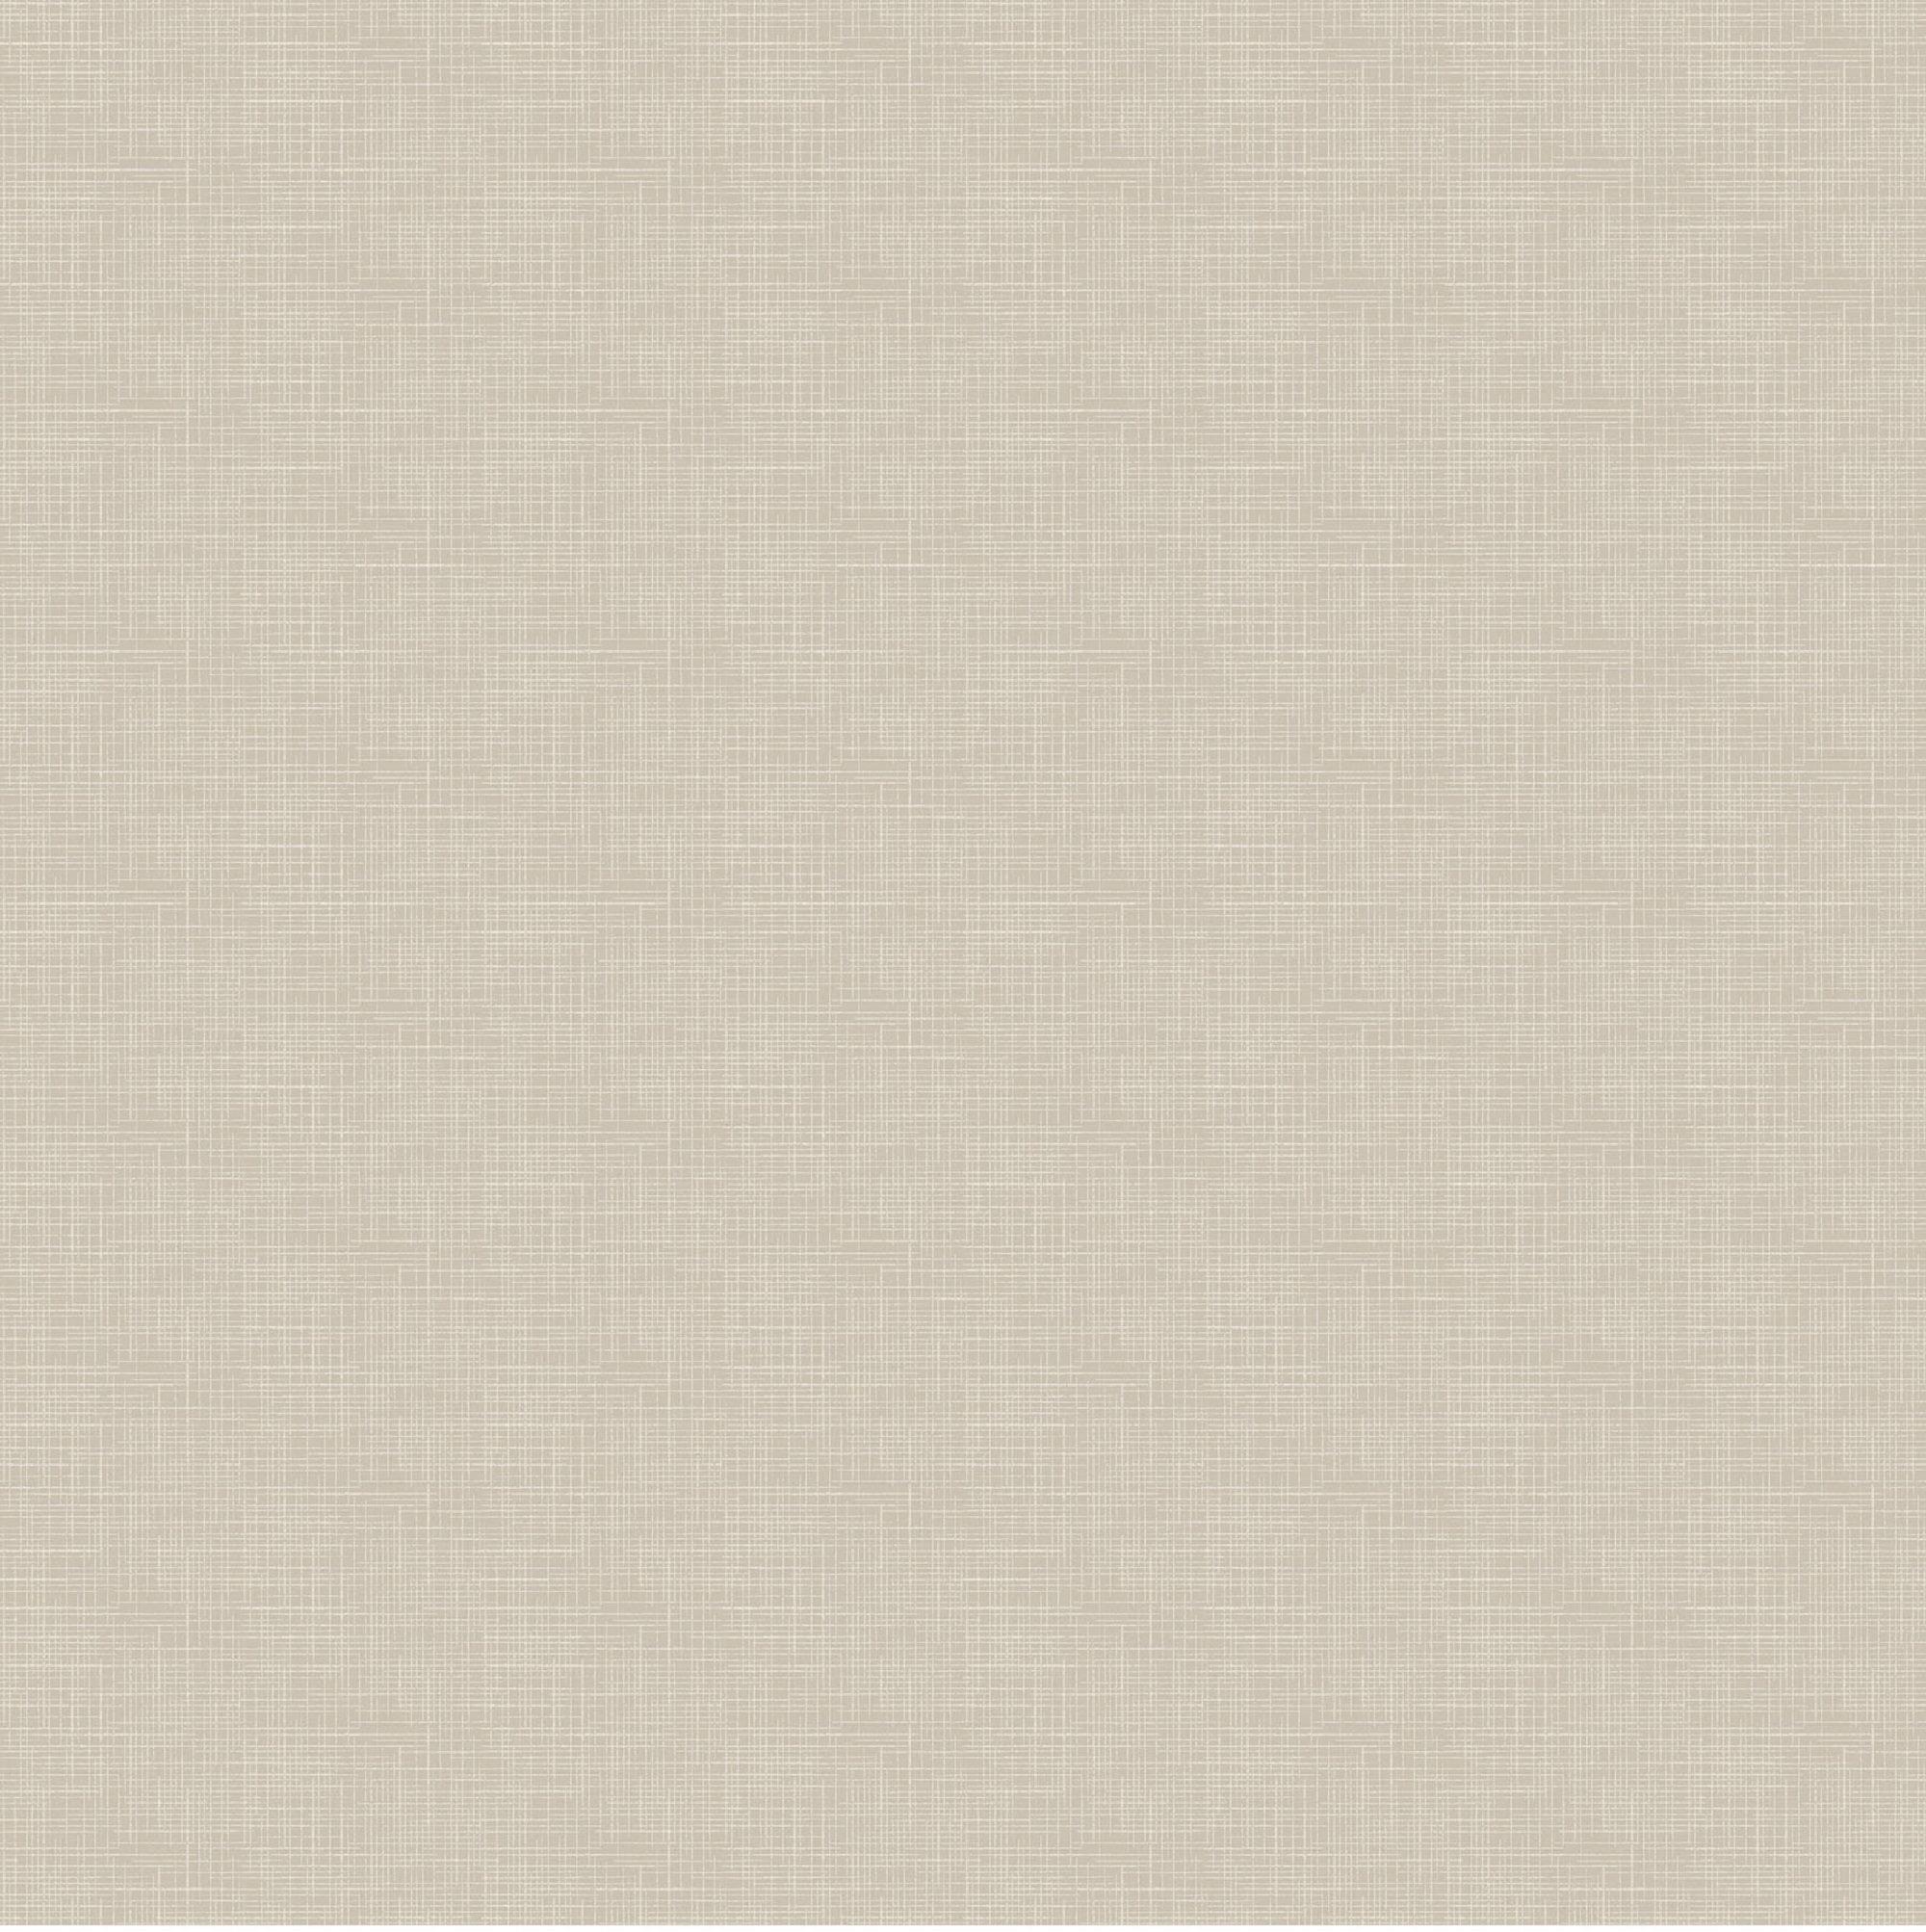 Dublin Fabric - Pebble - 9040-12 - Half Yard